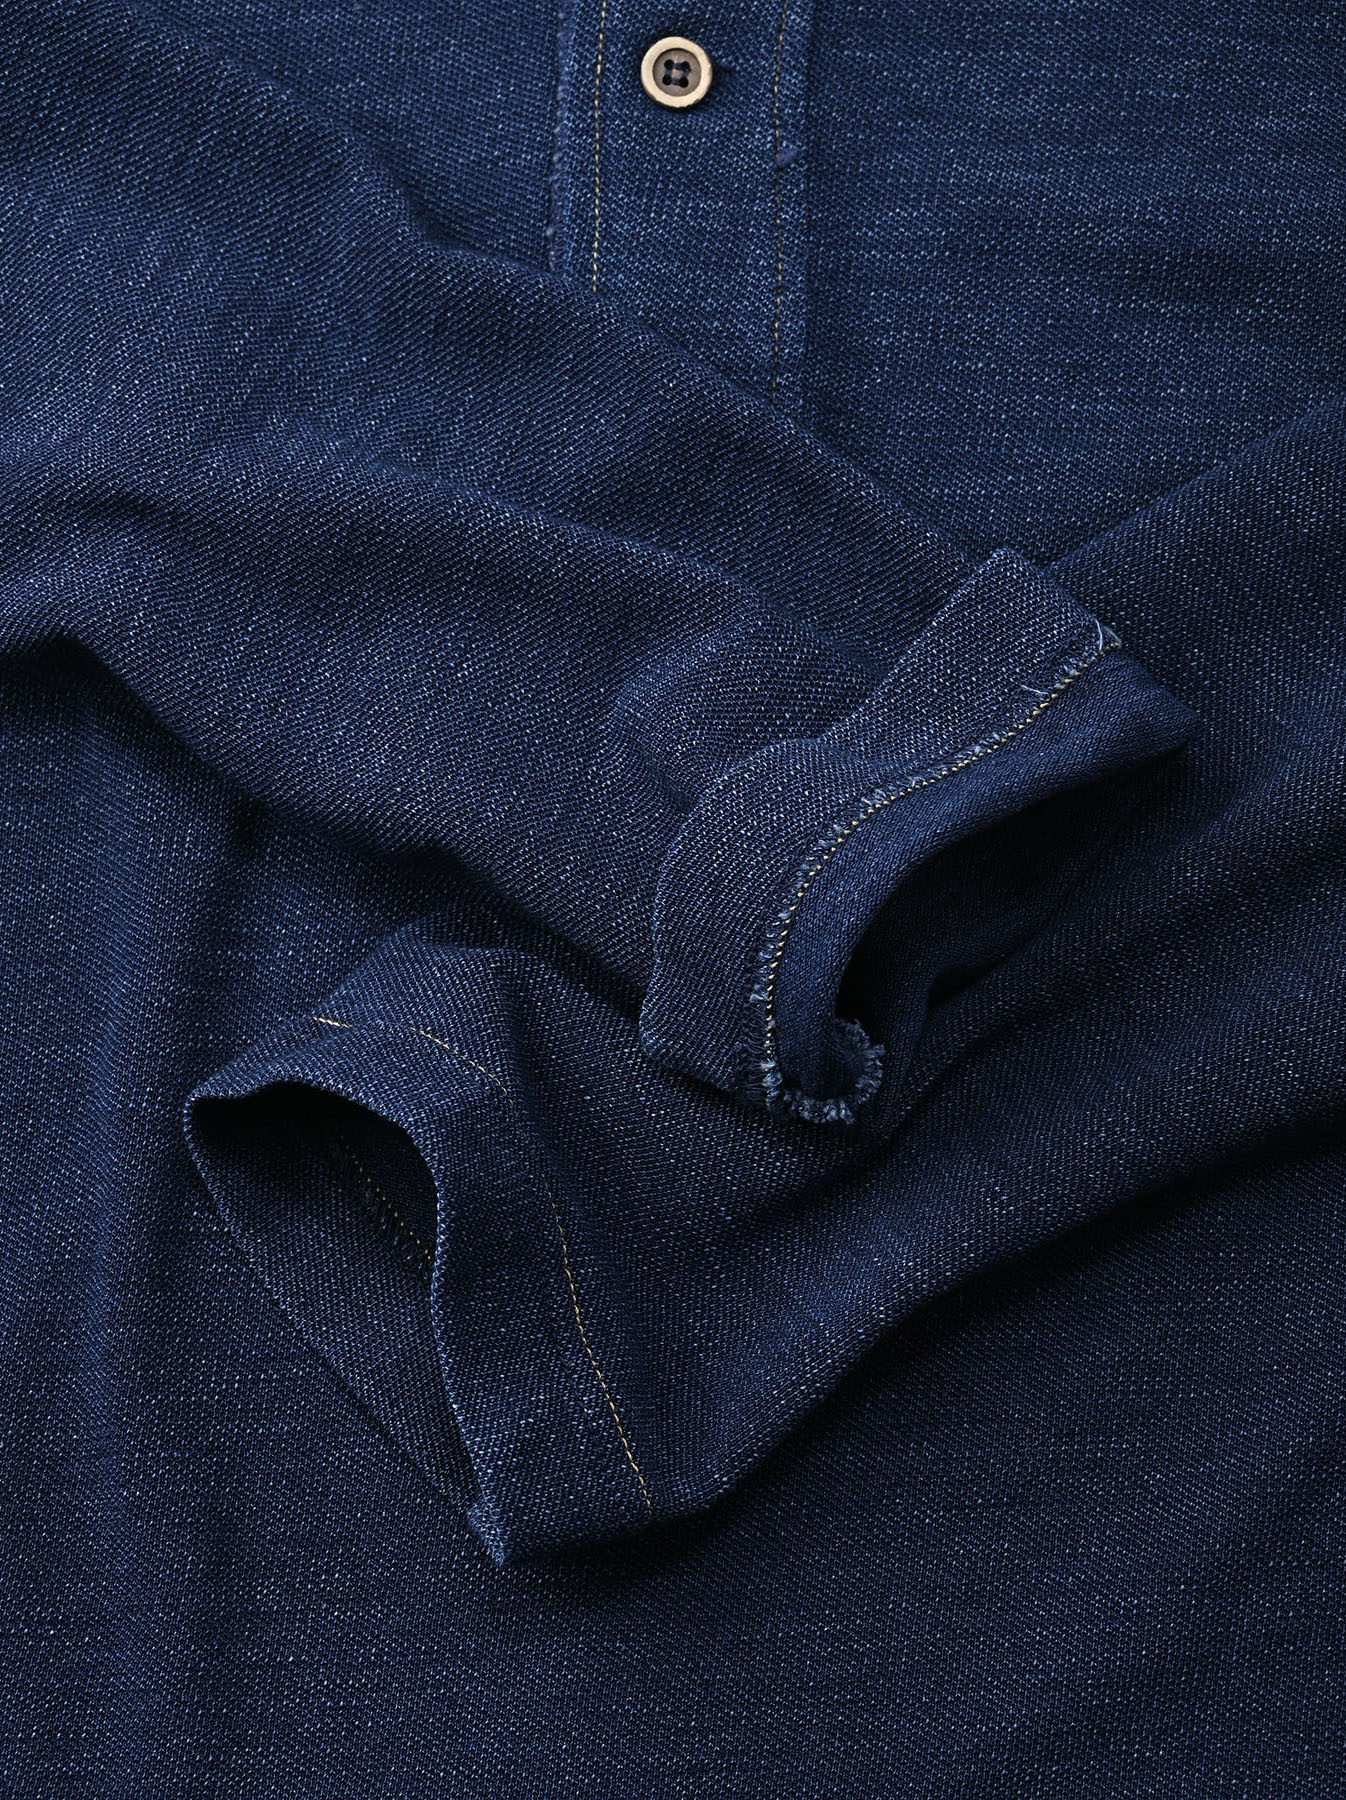 Indigo Kanoko Shiokaze Long-sleeved Square Polo Shirt (0521)-10